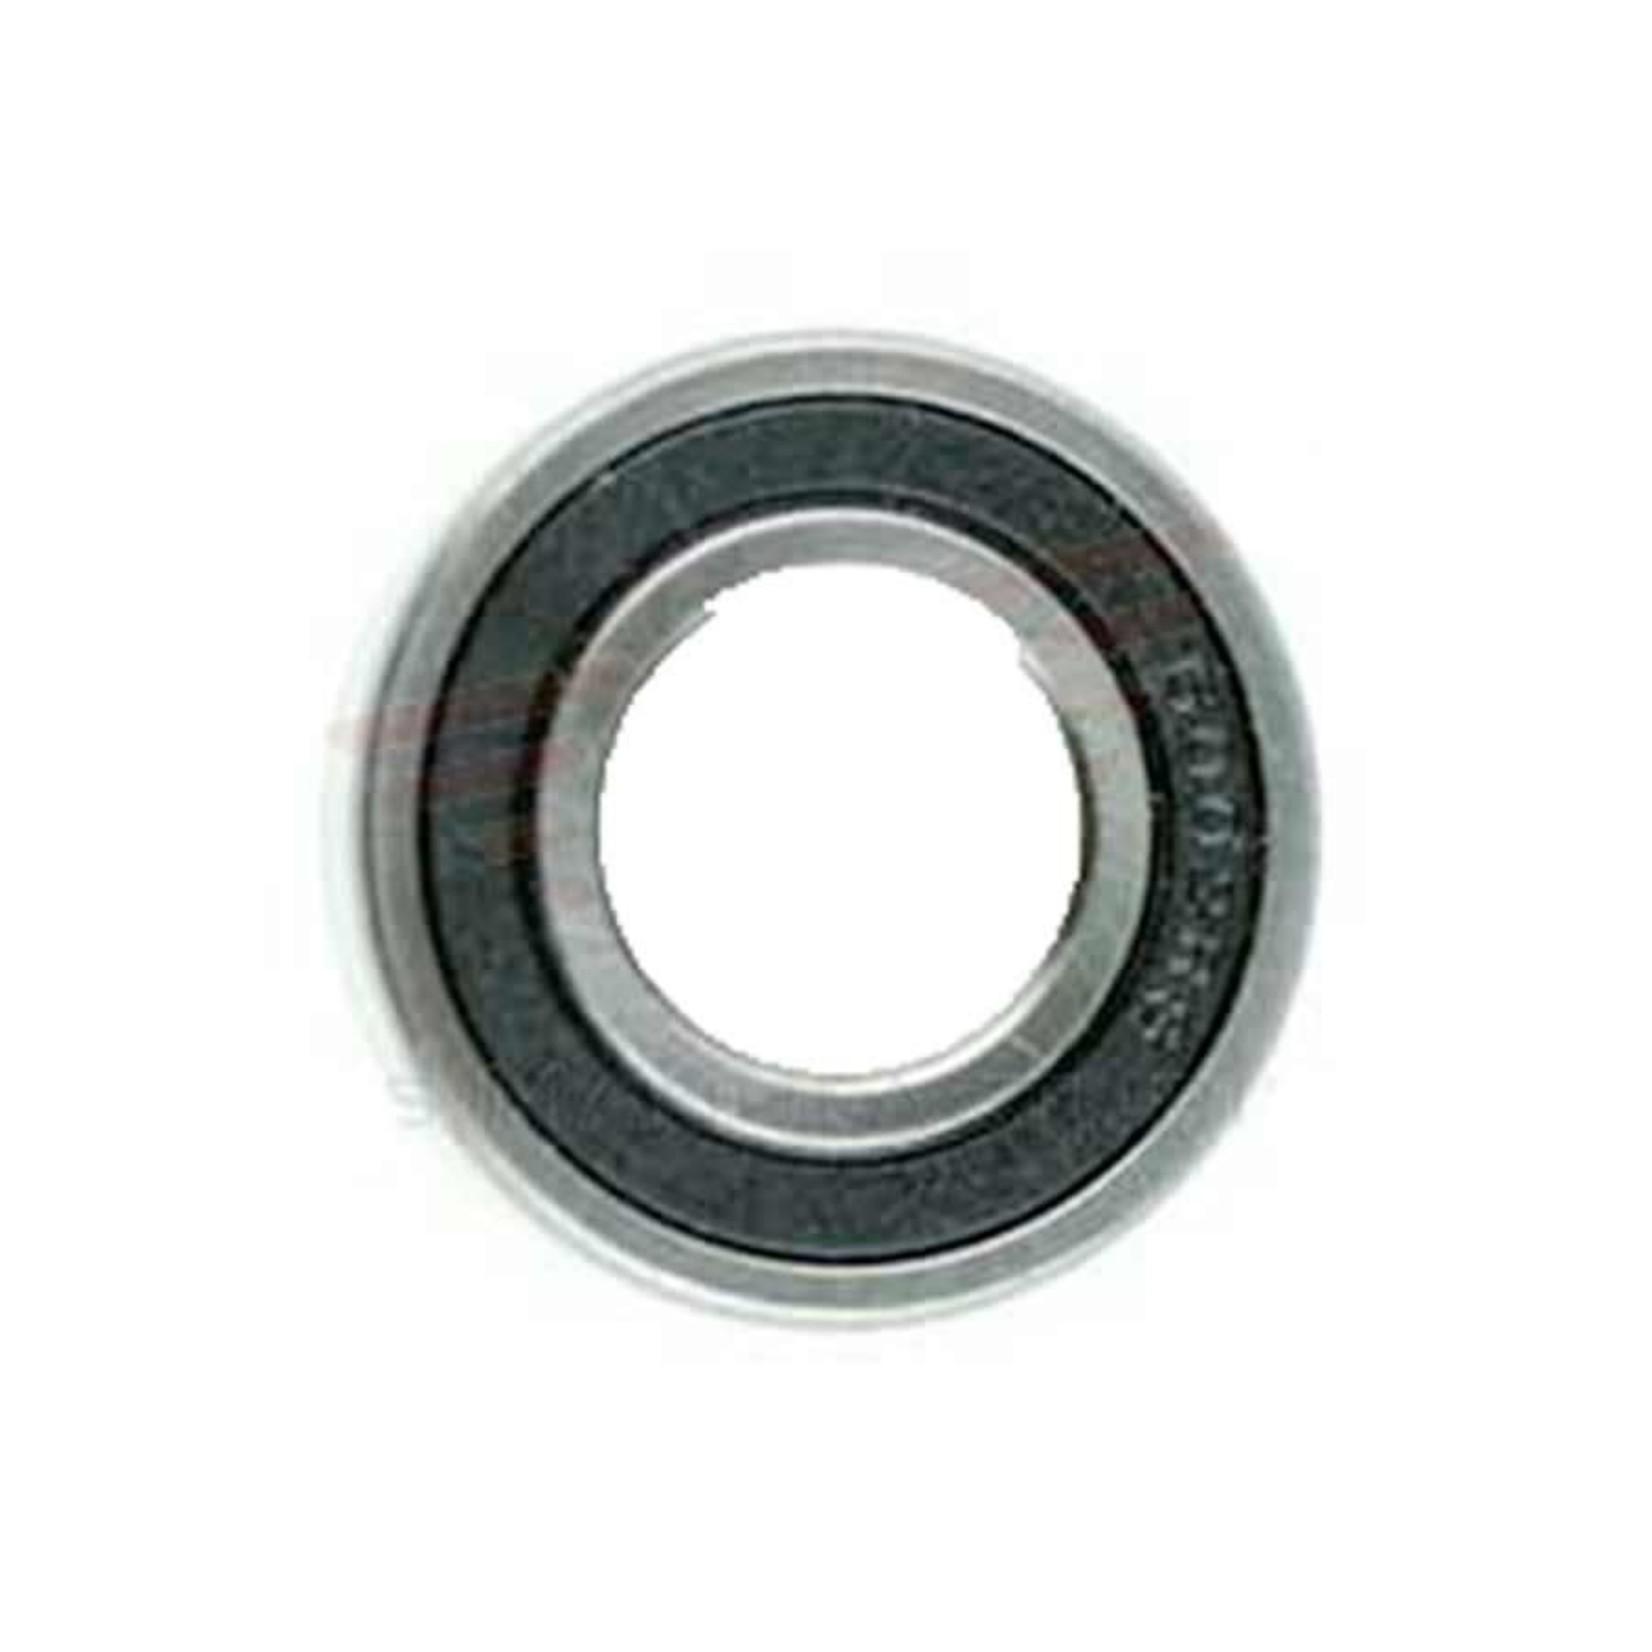 Wheel Manufacturing SB5-6801, Roulements scelles, 12x21x5mm, Unite